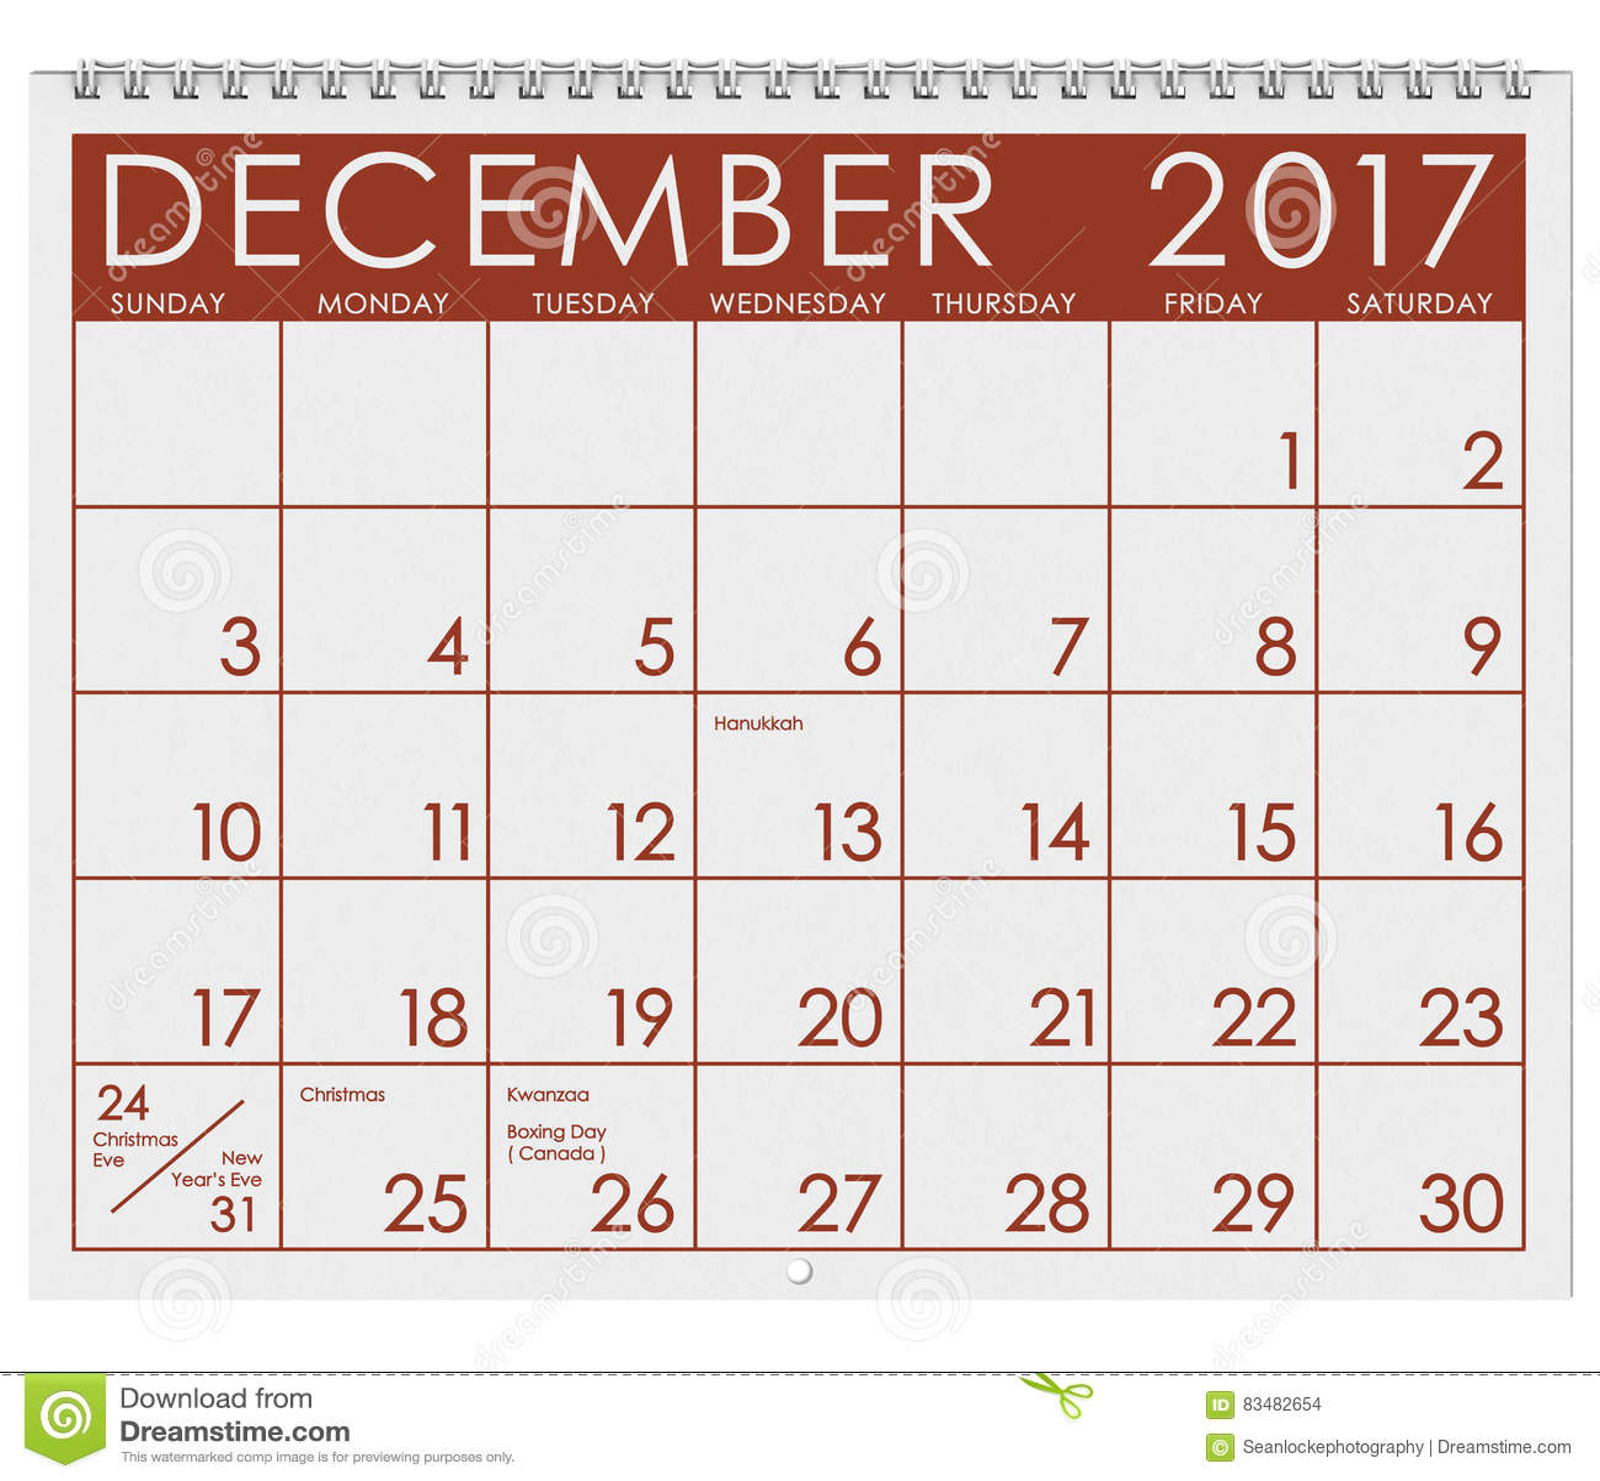 Christmas Calendar 2017 : Calendar month of december with christmas holiday